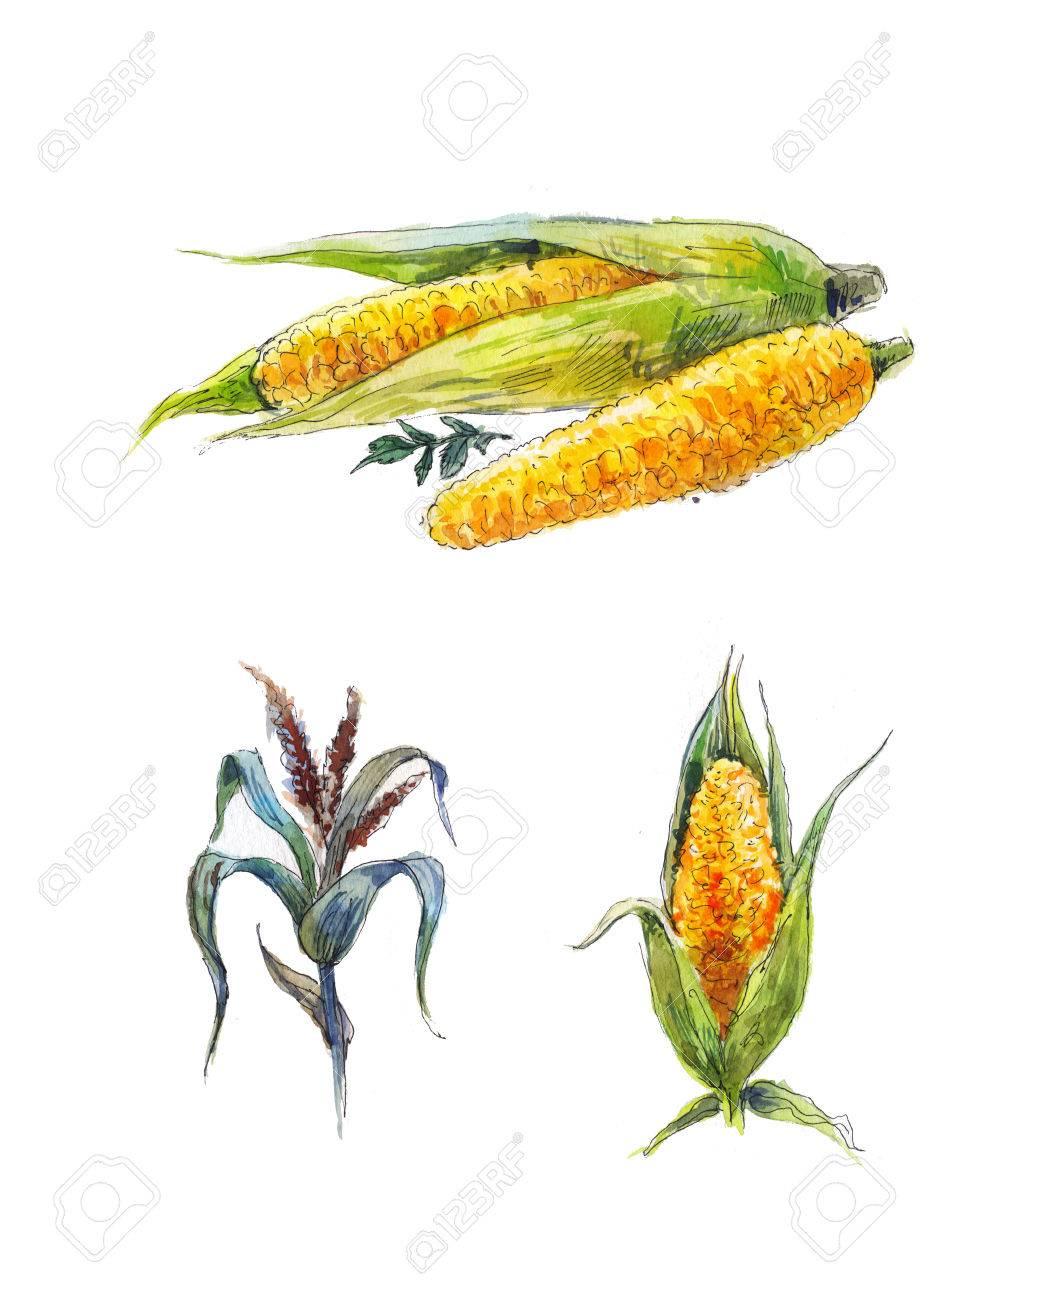 Mais Aquarellskizze, Gemüsemalerei, Isoliert Auf Weiß Lizenzfreie ...